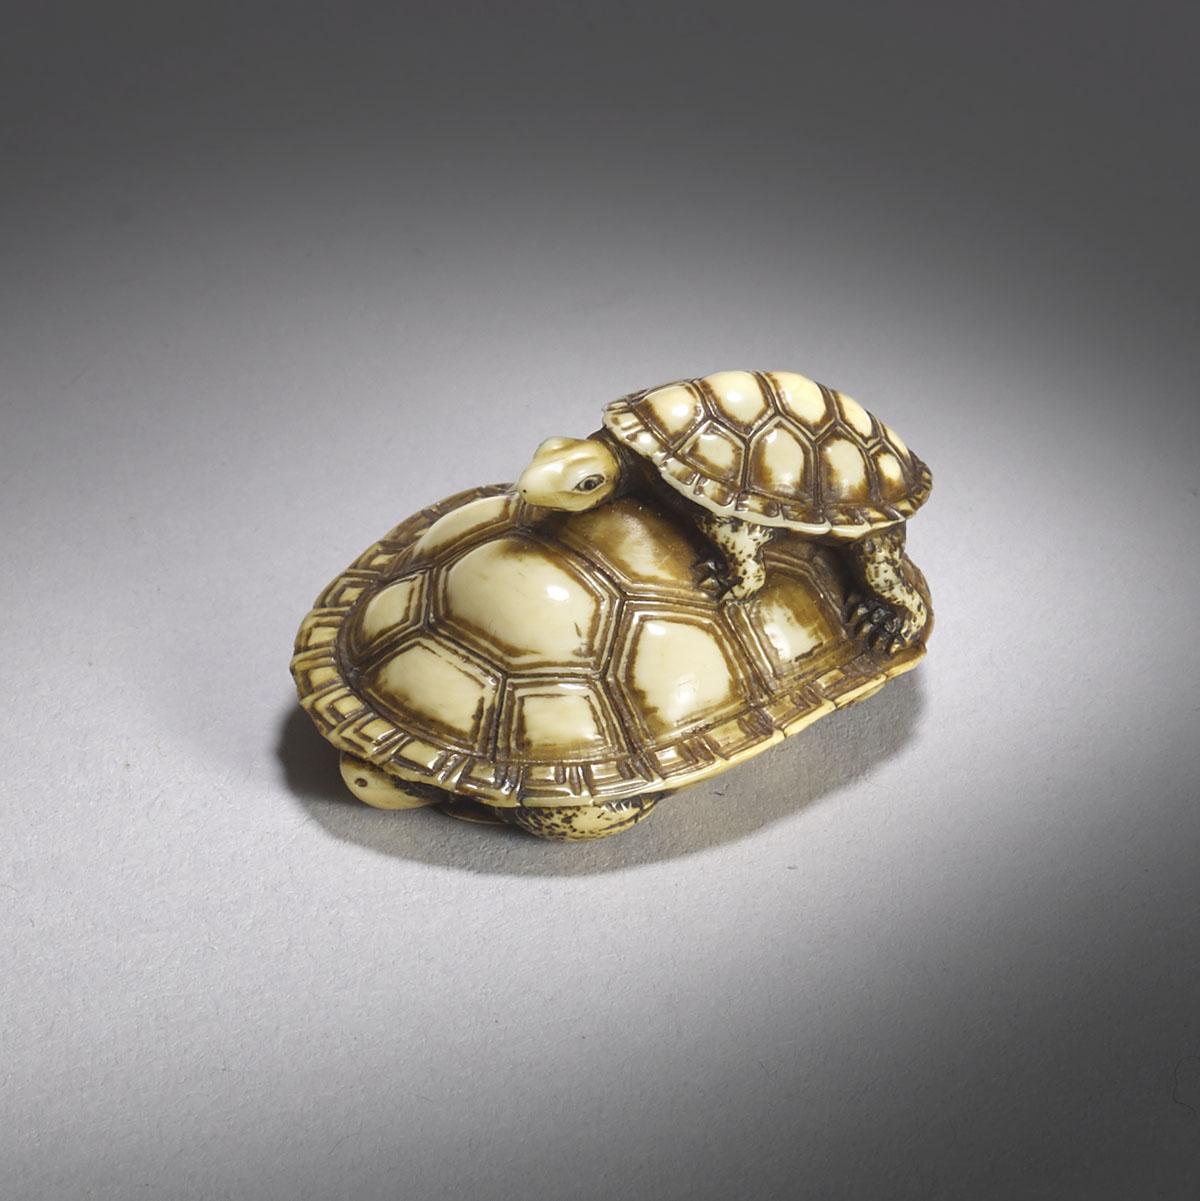 Doraku, ivory netsuke of turtles